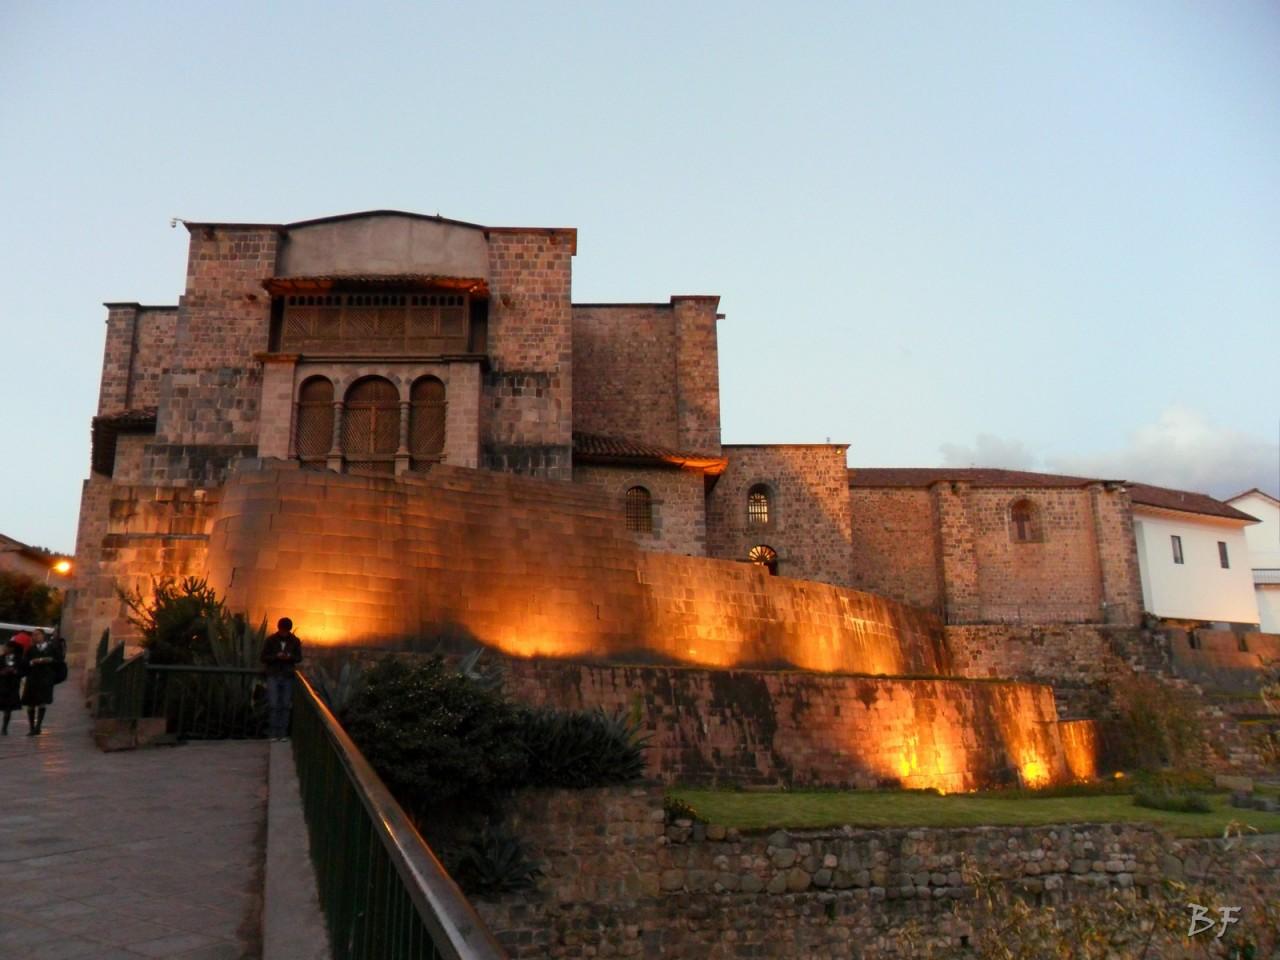 Mura-Poligonali-Megaliti-Tempio-Coricancha-Cusco-Perù-13